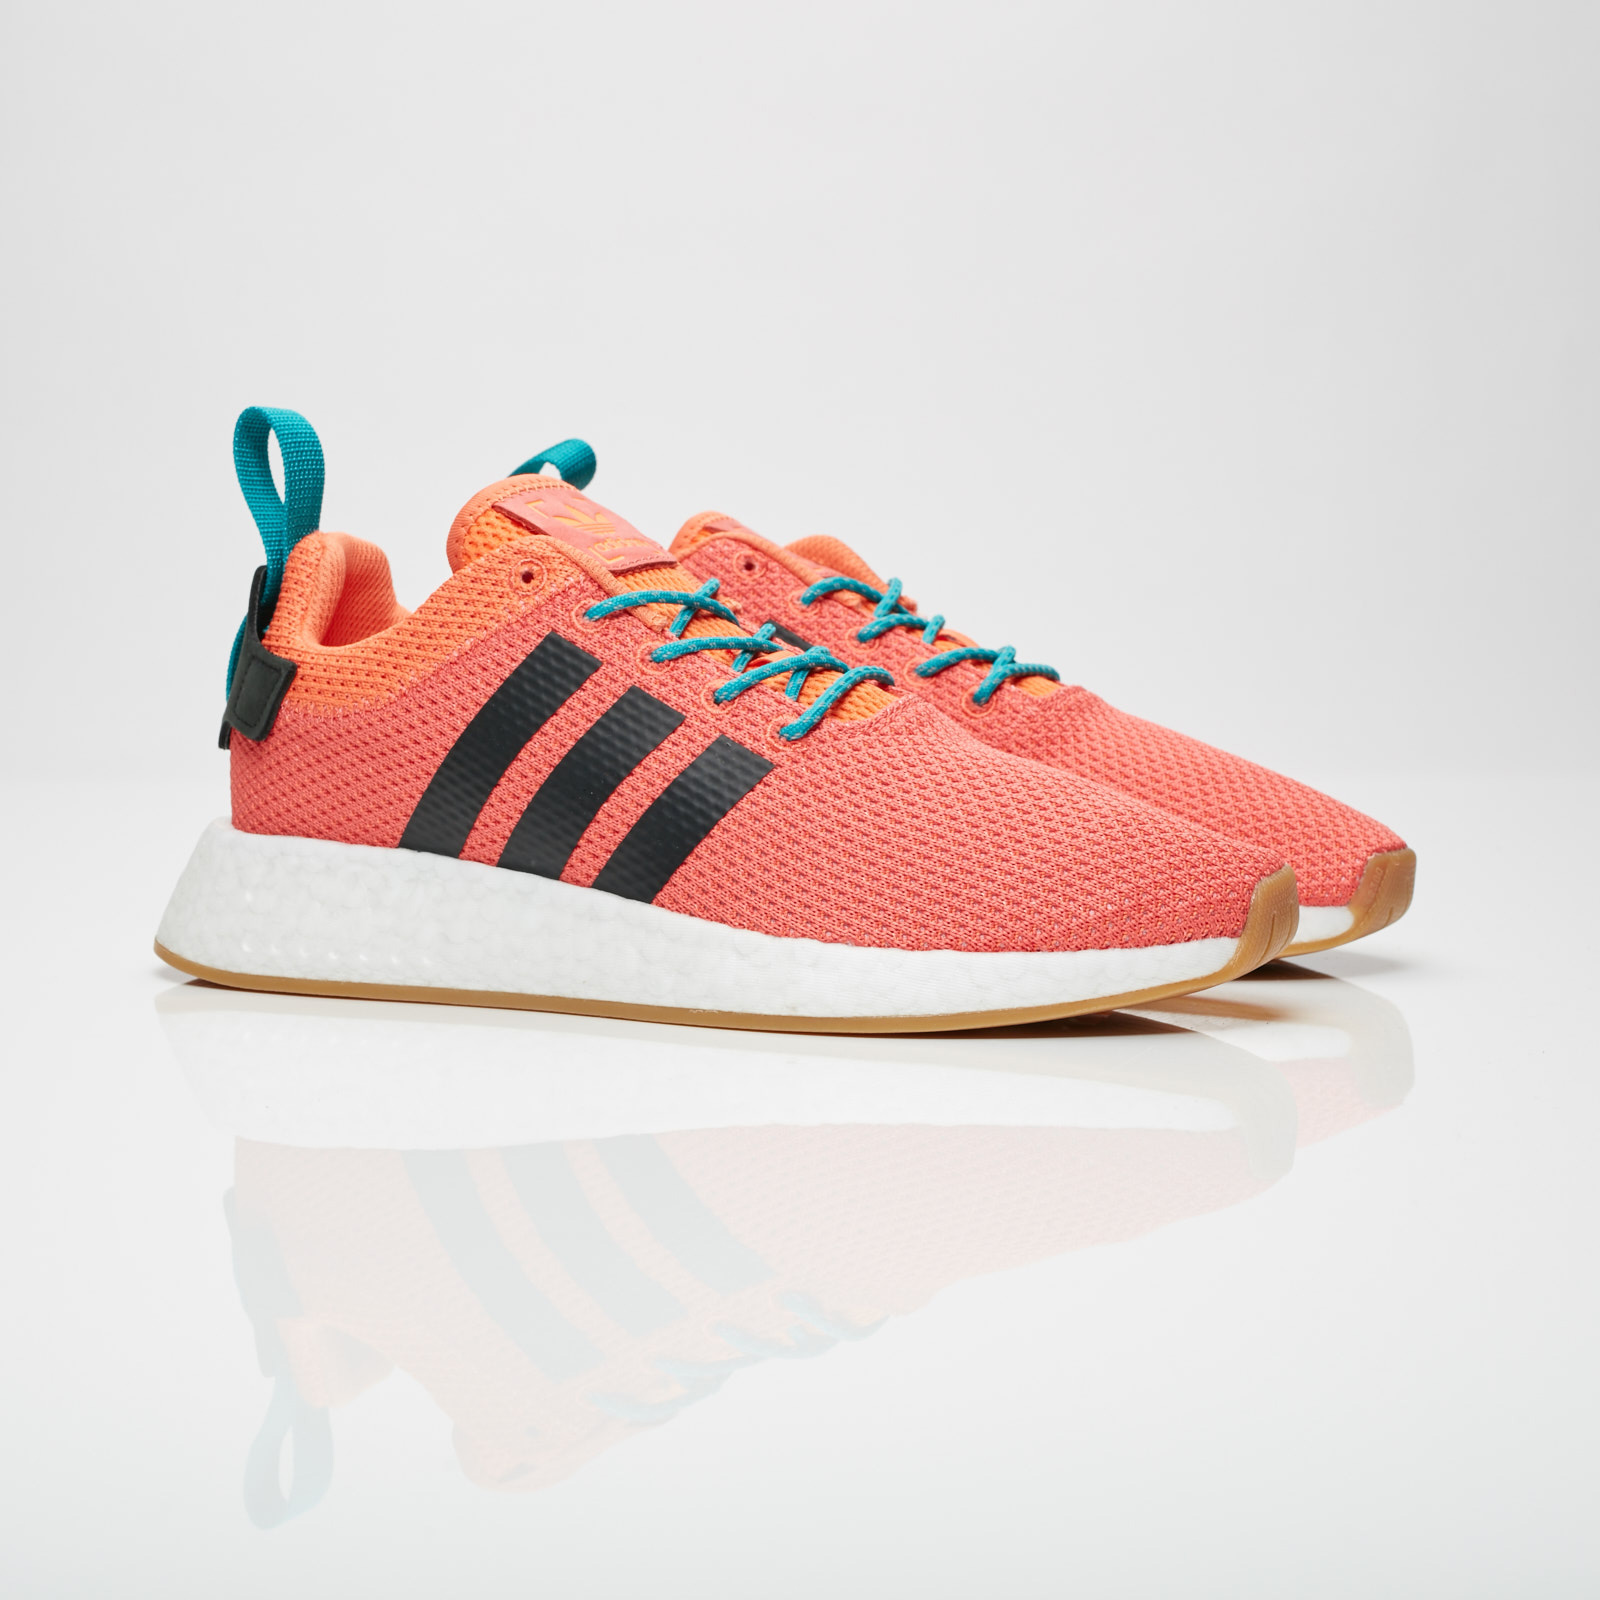 cc895406de96f adidas NMD R2 Summer - Cq3081 - Sneakersnstuff